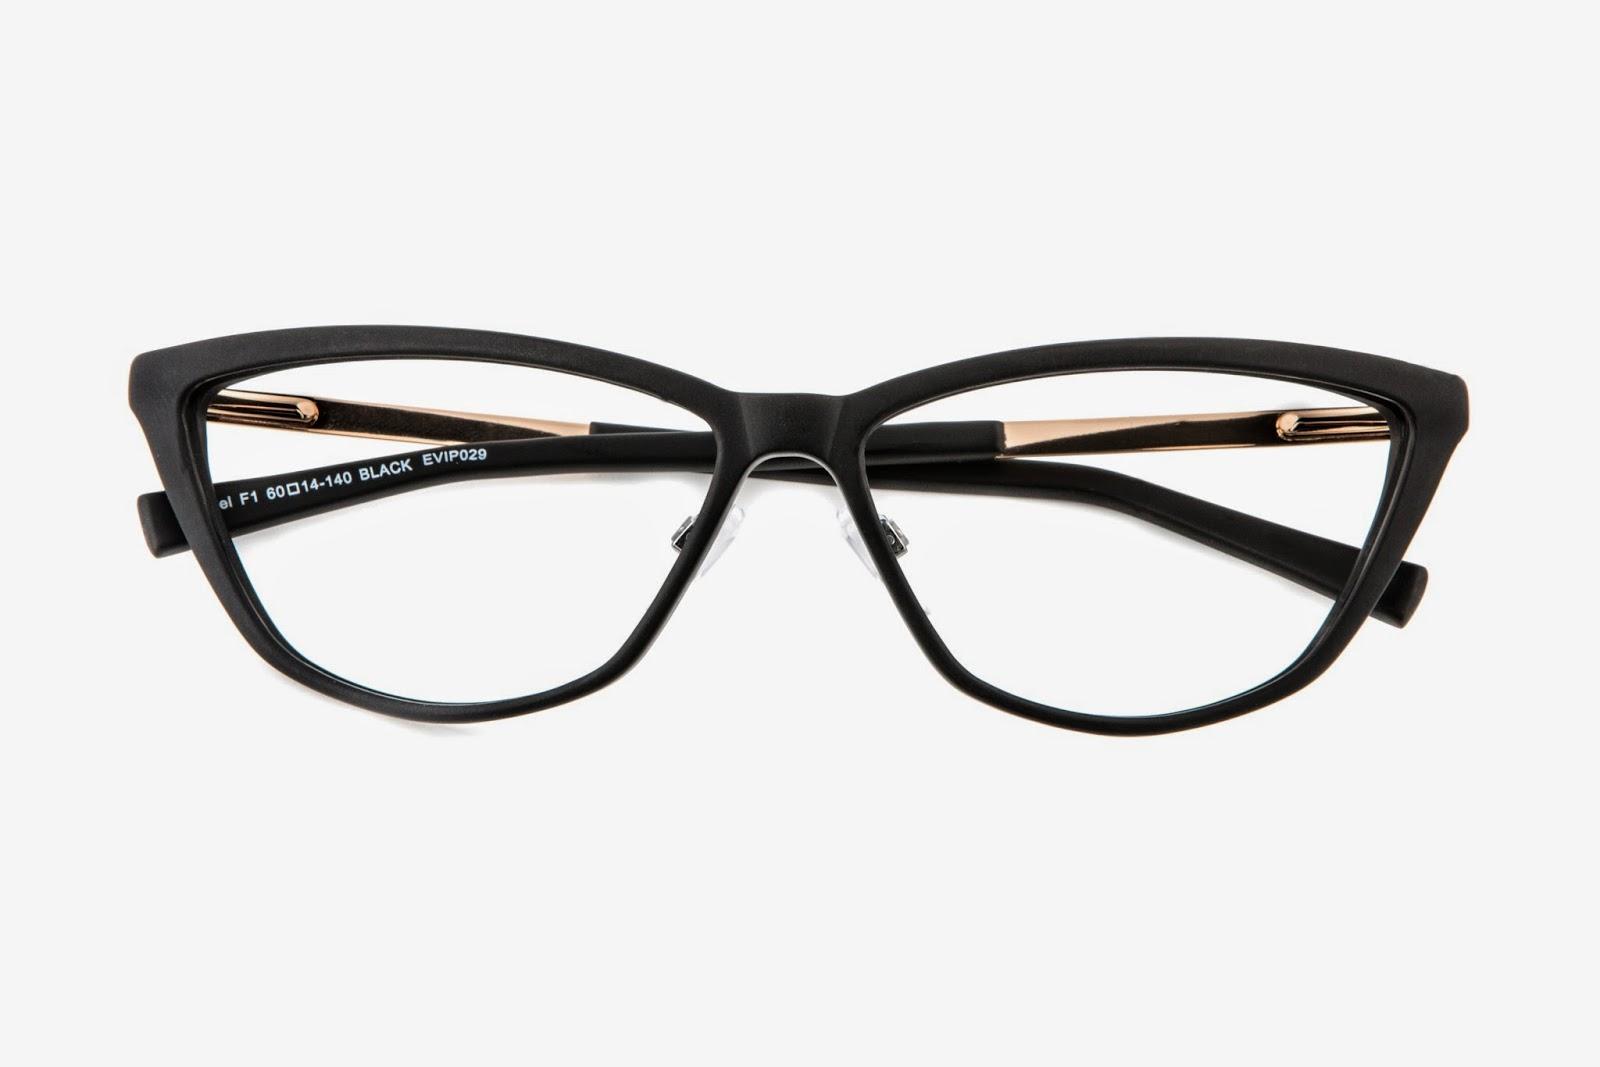 da7793ee48ce Osiris Eyewear brand x Fashion designer Jorgen Simonson   a bold striking  collection